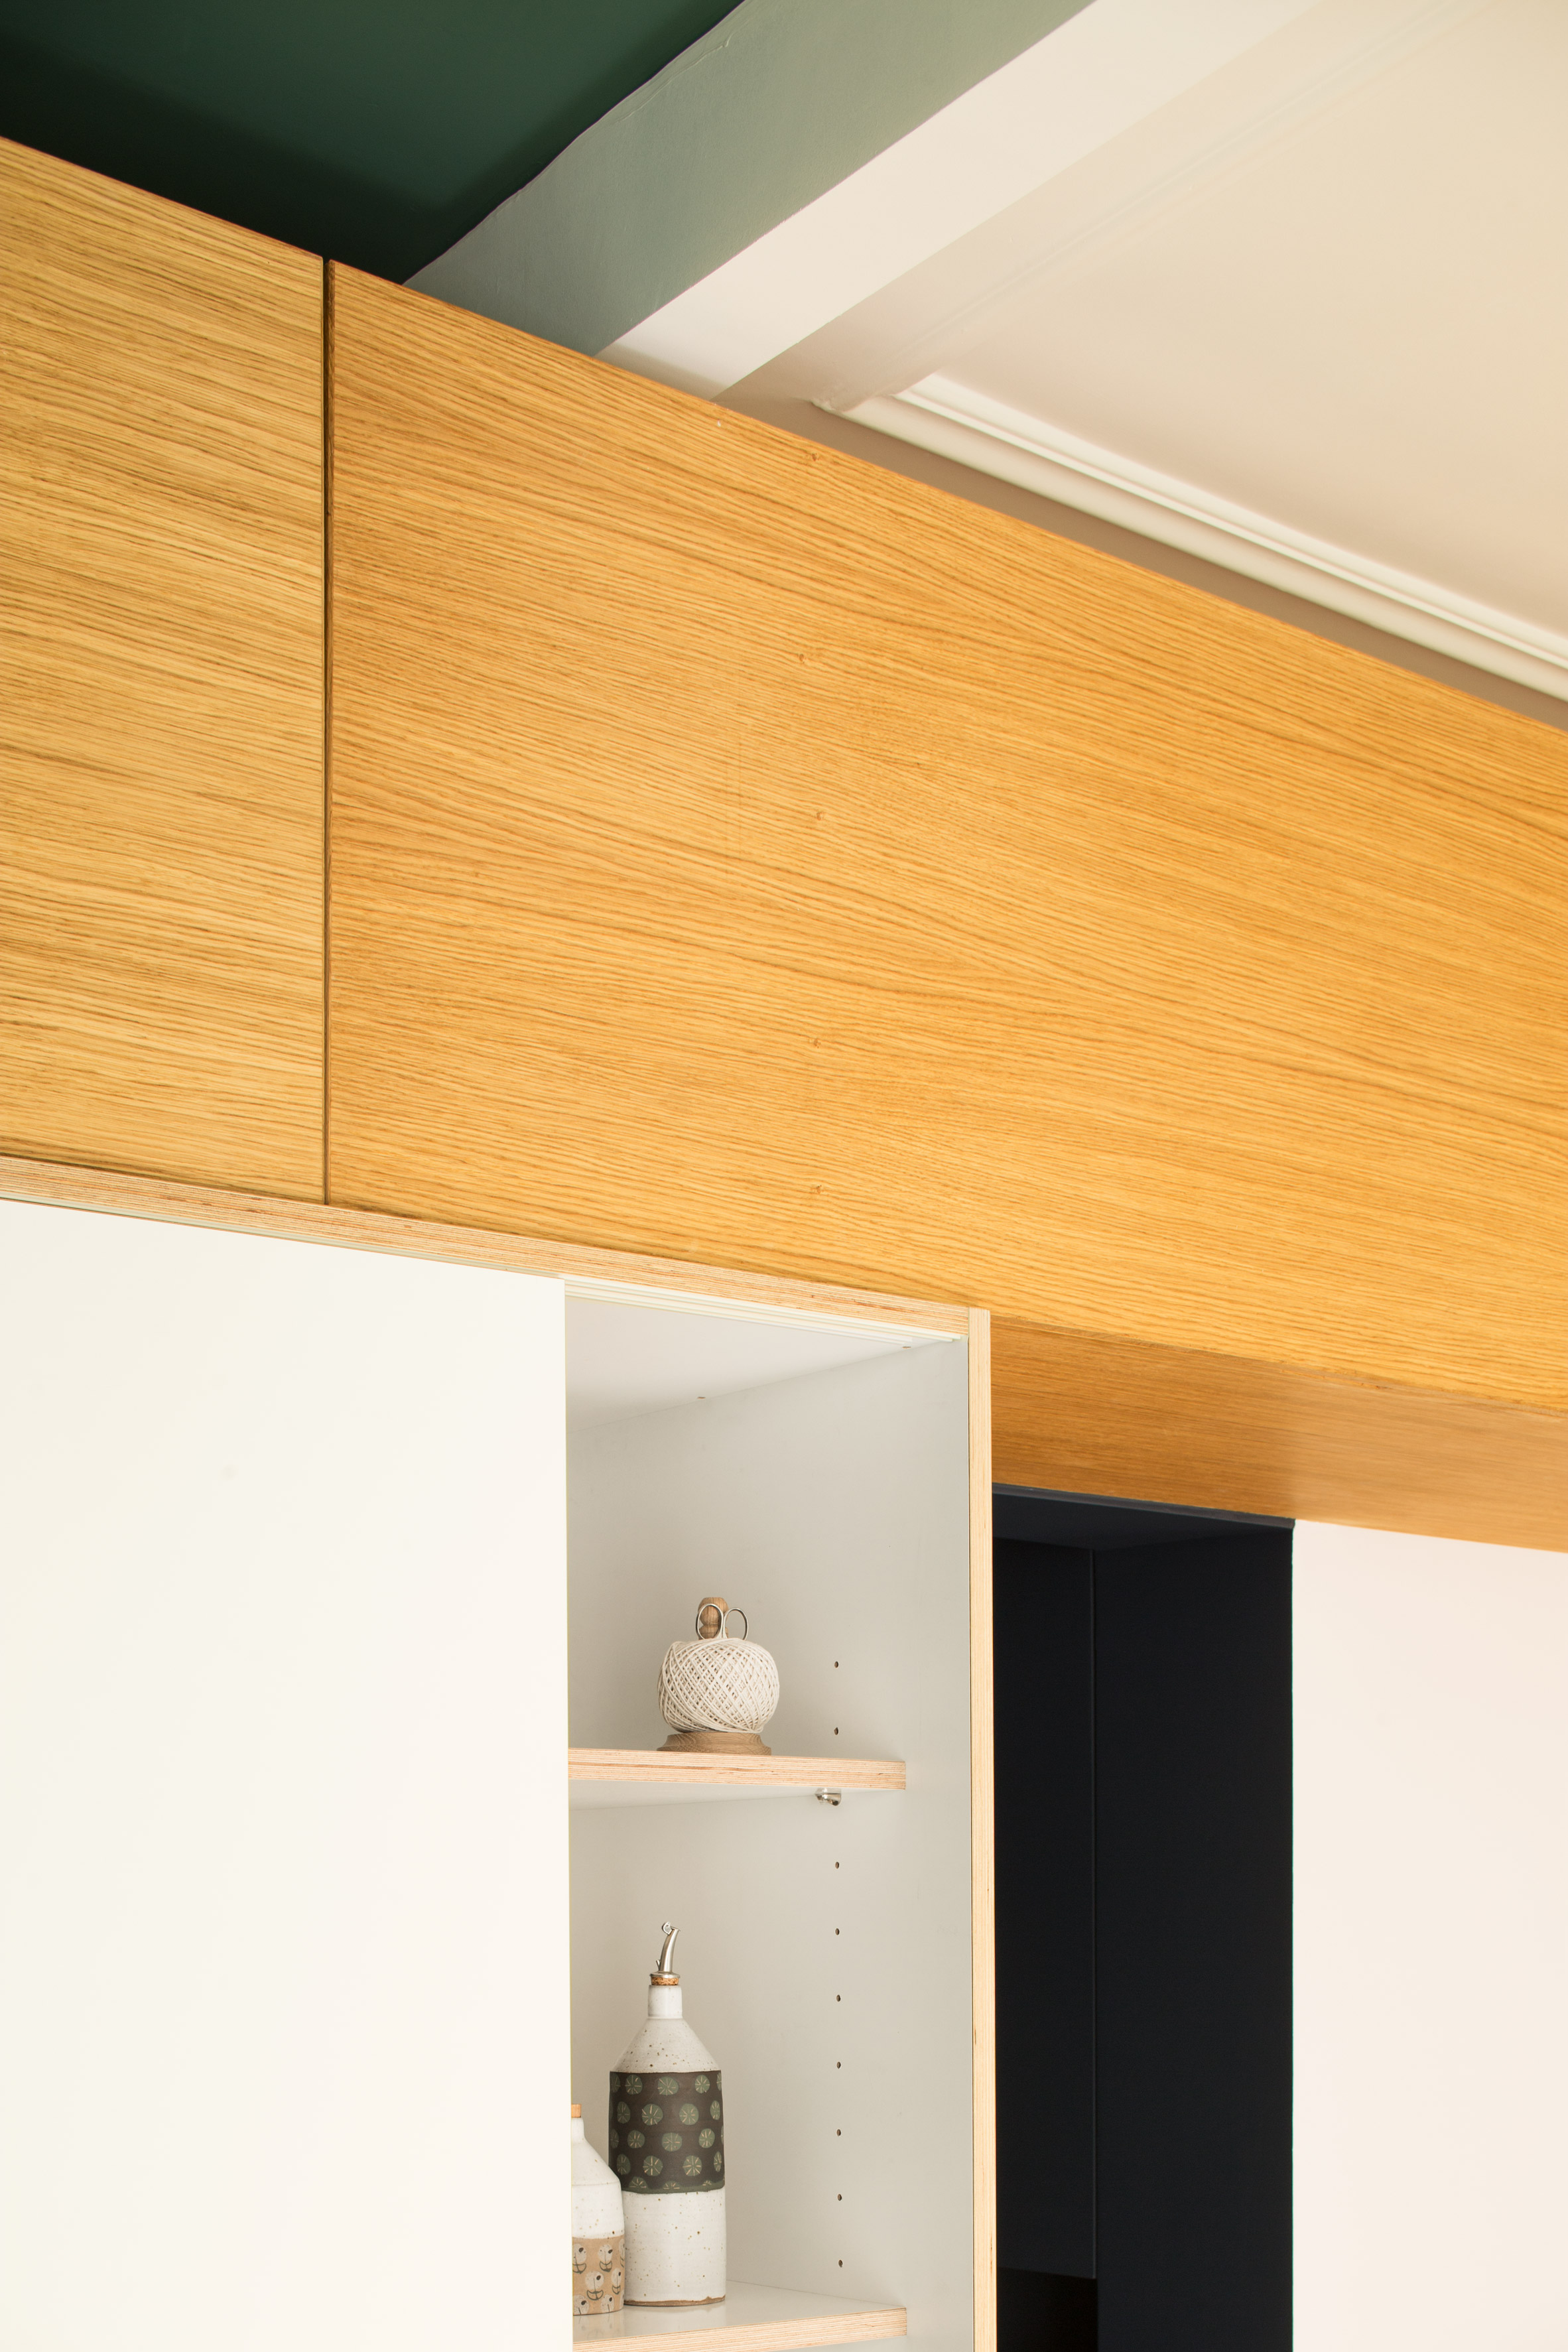 architecture-paris-apartment-design-studia-interiors-osnovadesign-osnova-poltava_12